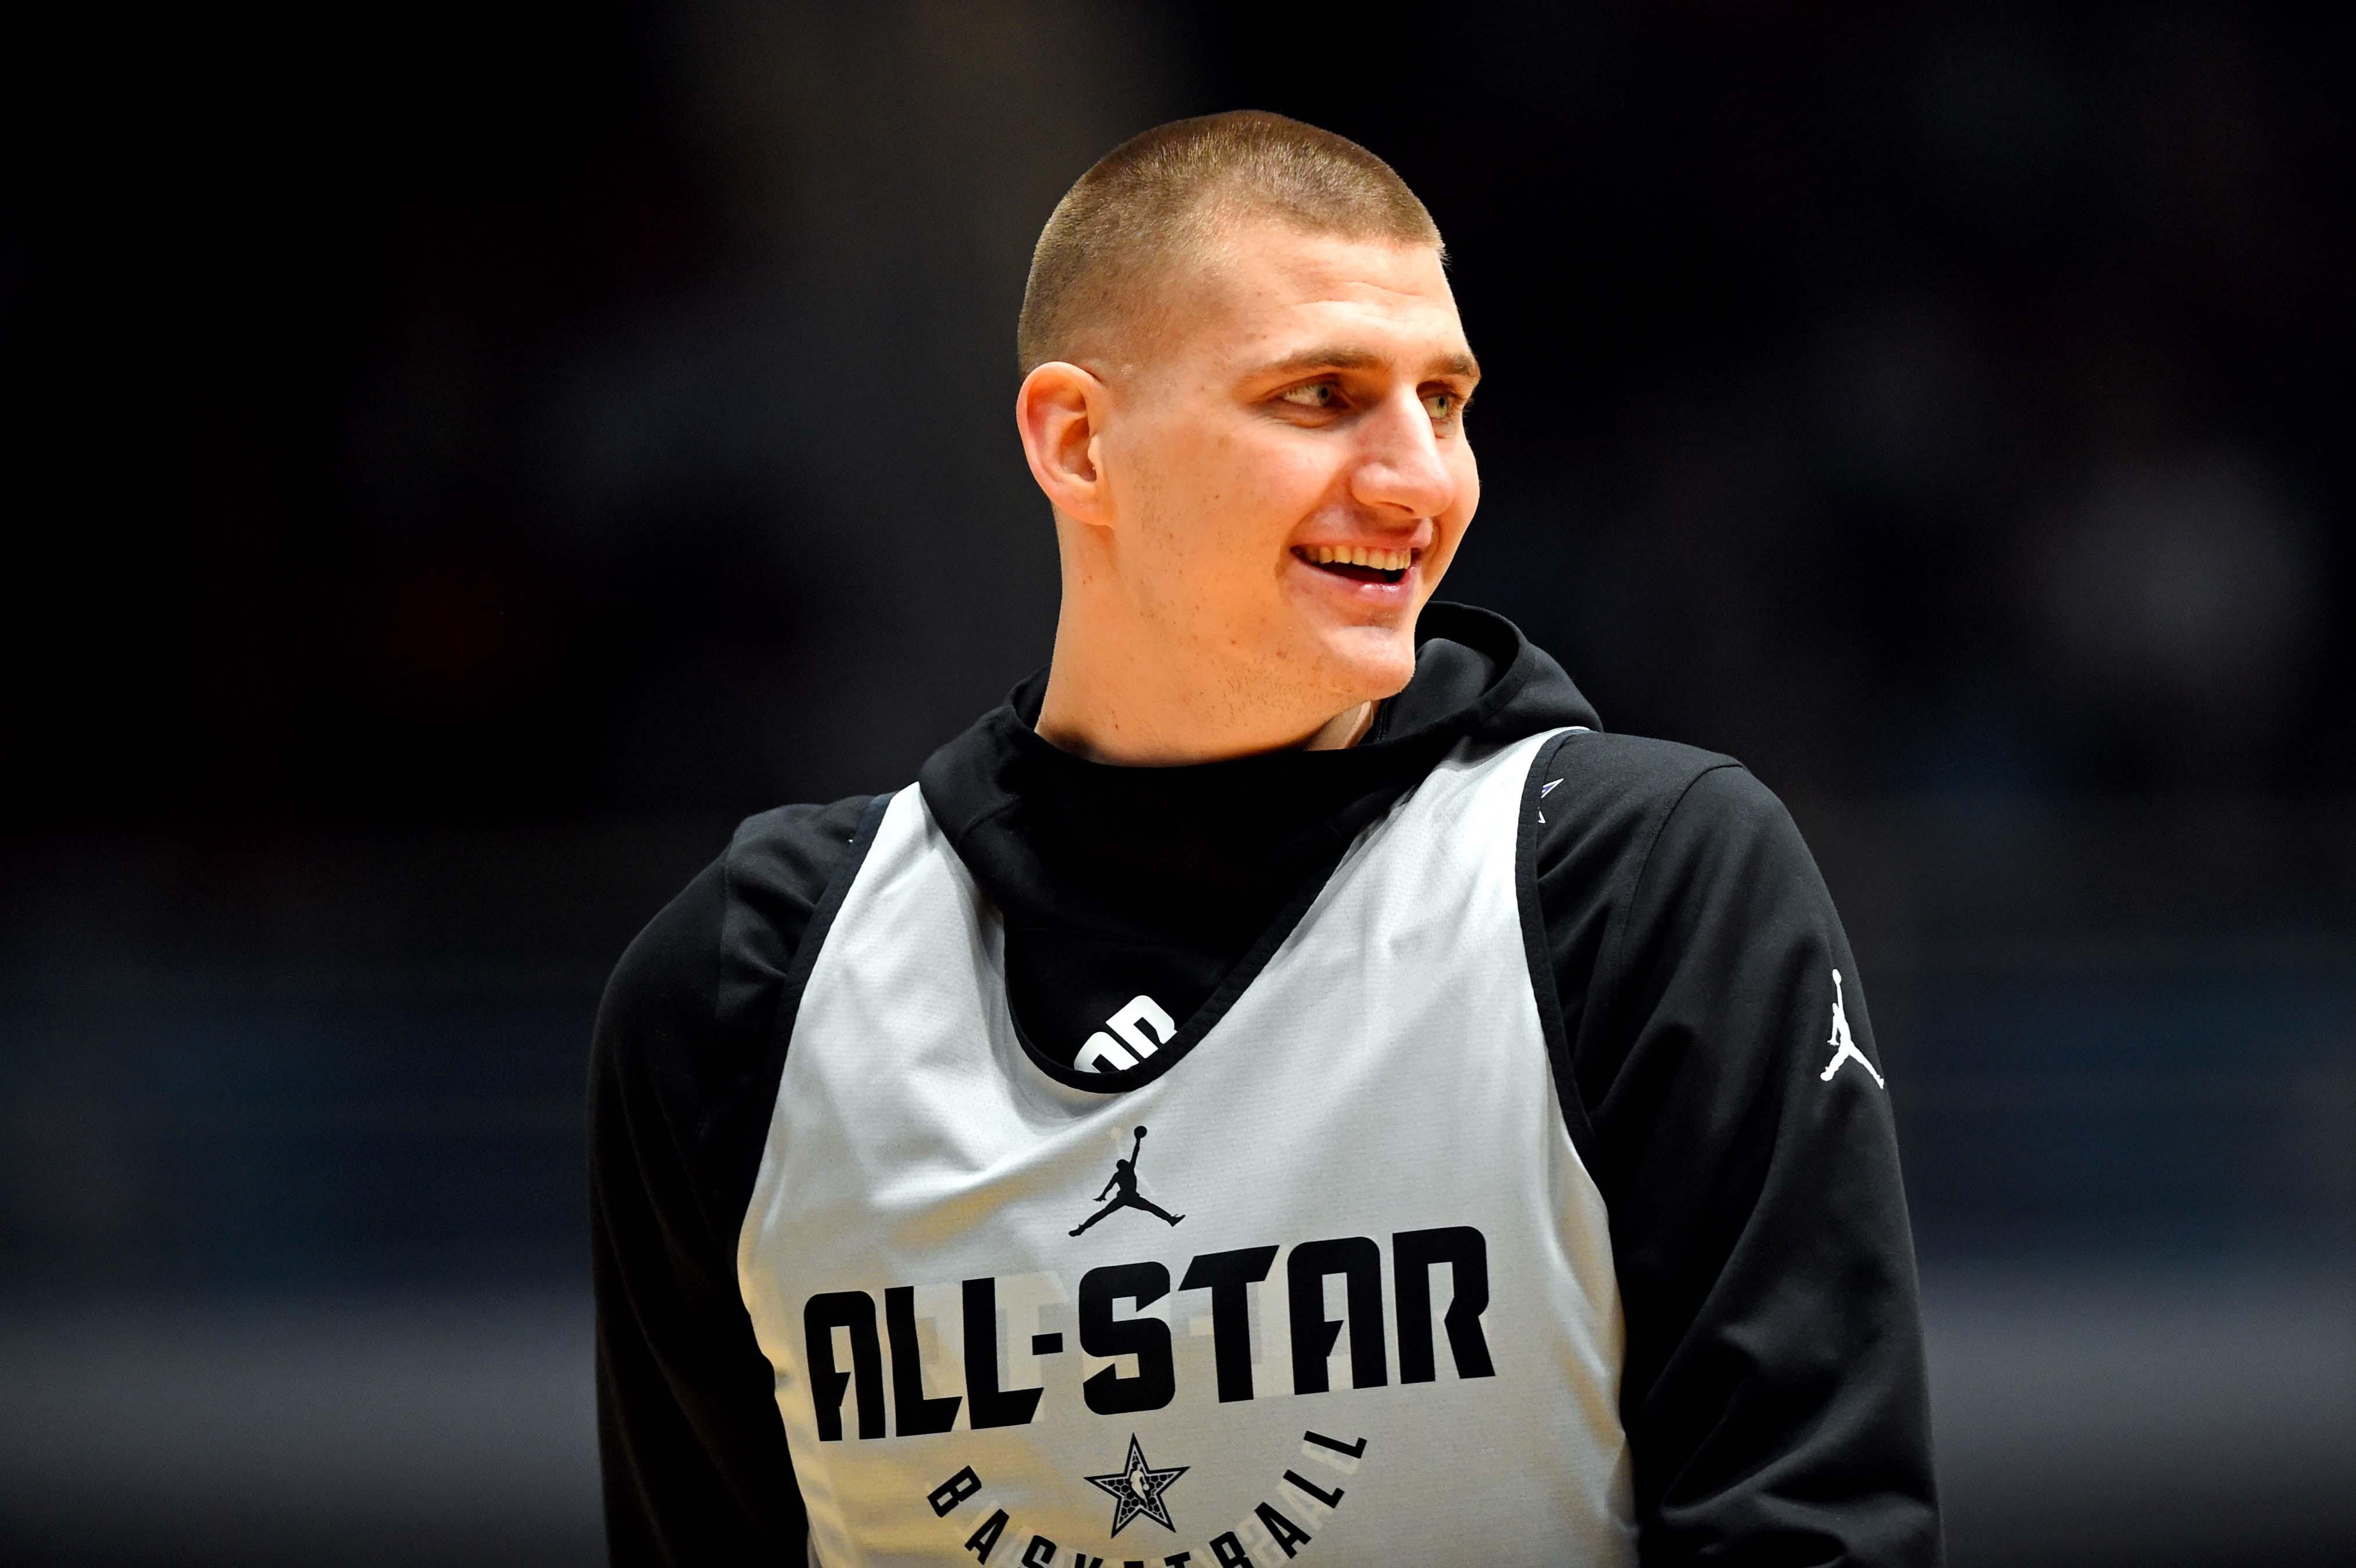 Team Giannis center Nikola Jokic of the Denver Nuggets (15) during NBA All-Star Game practice at the Bojangles Coliseum.